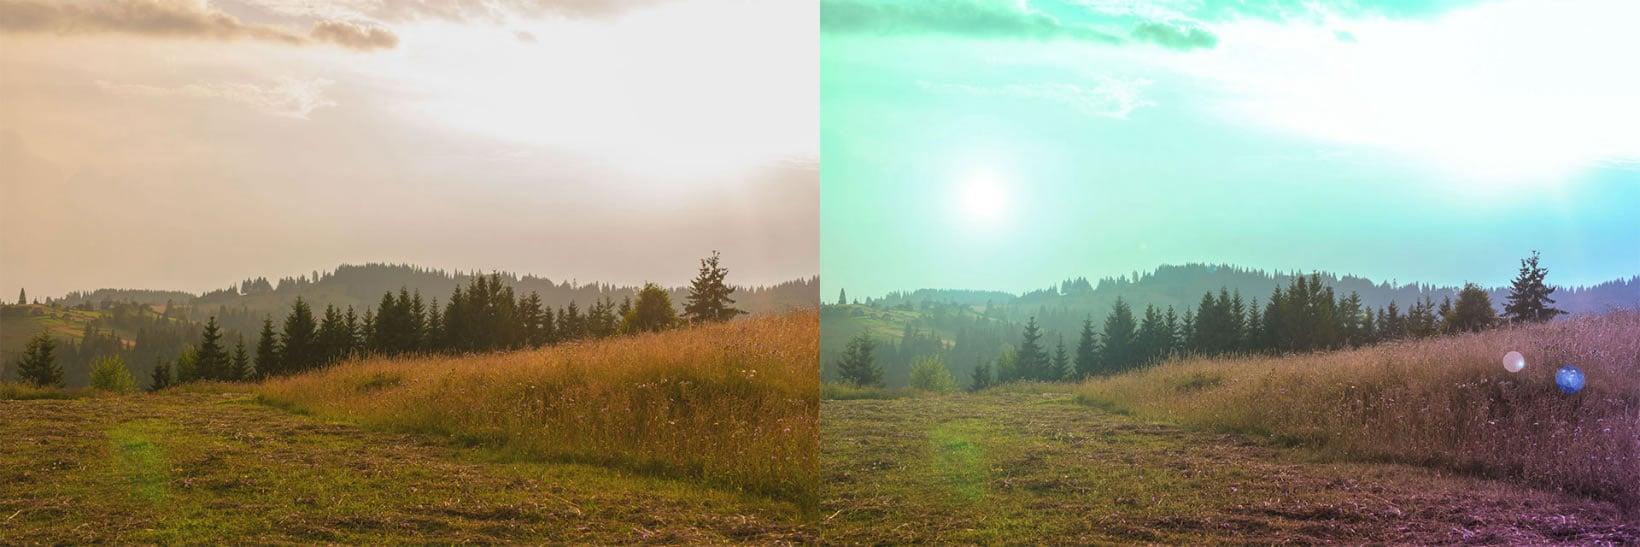 Add photo textures